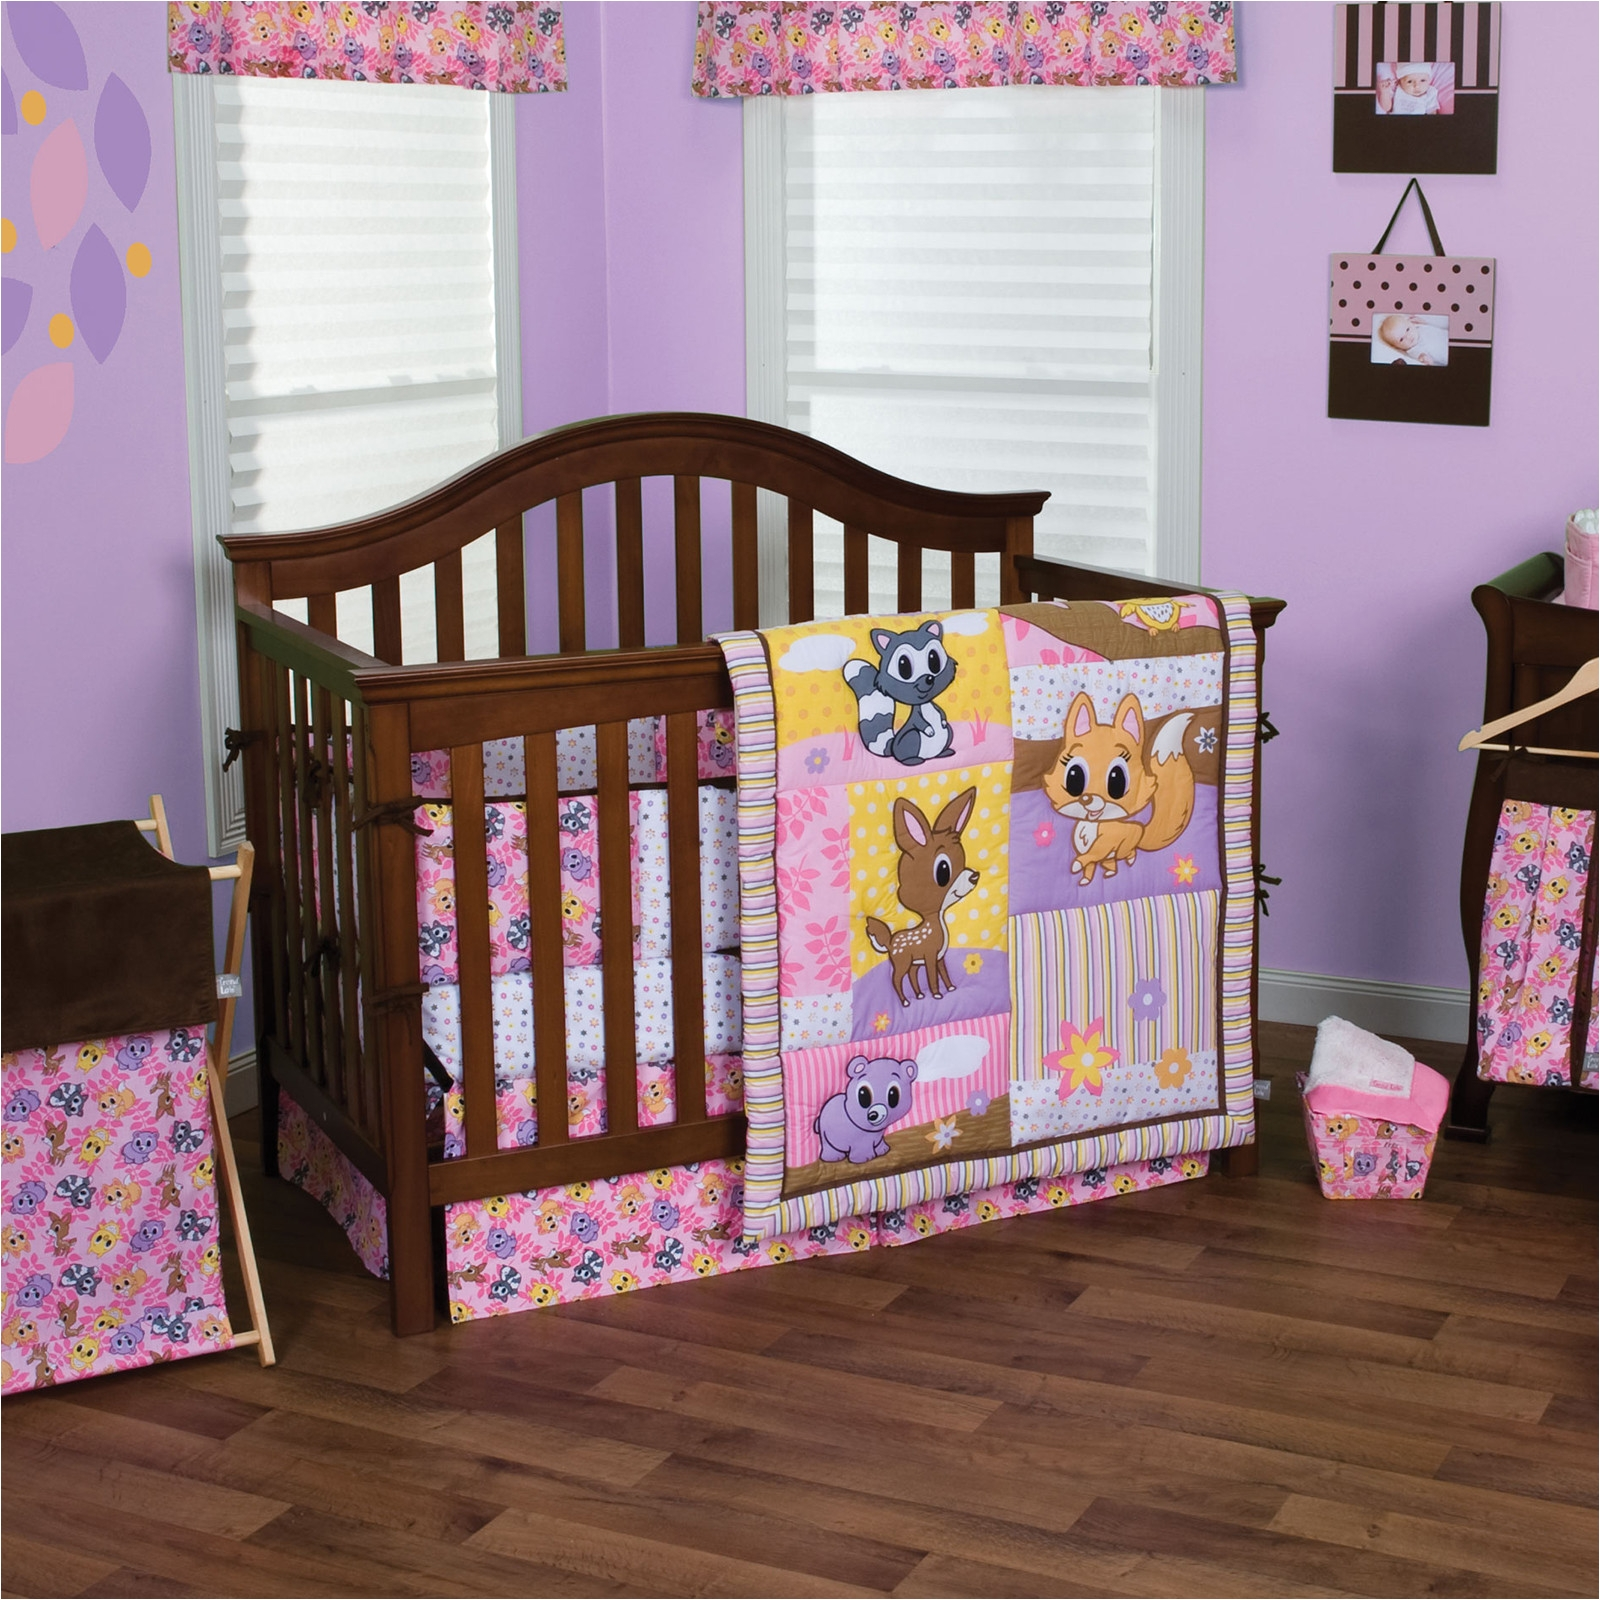 crib mattress burlington coat factory inspirational fox and friends baby bedding bedding designs